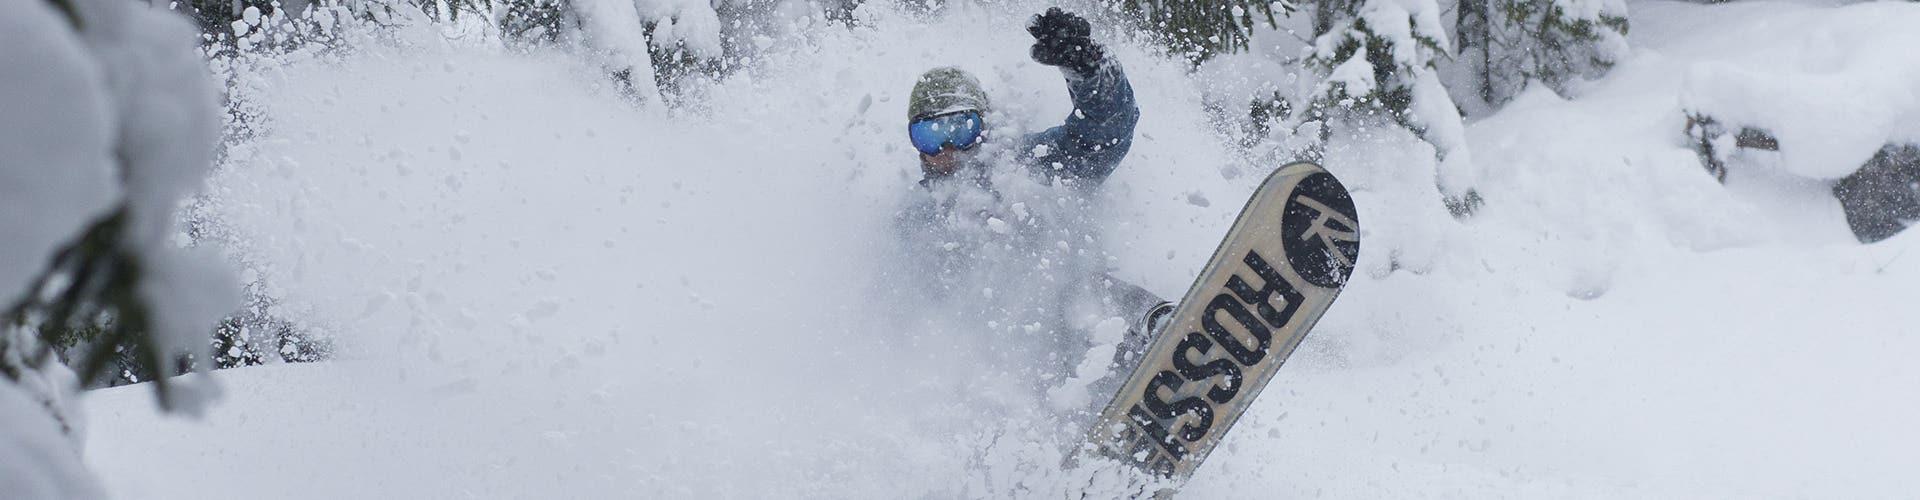 Masques snowboard